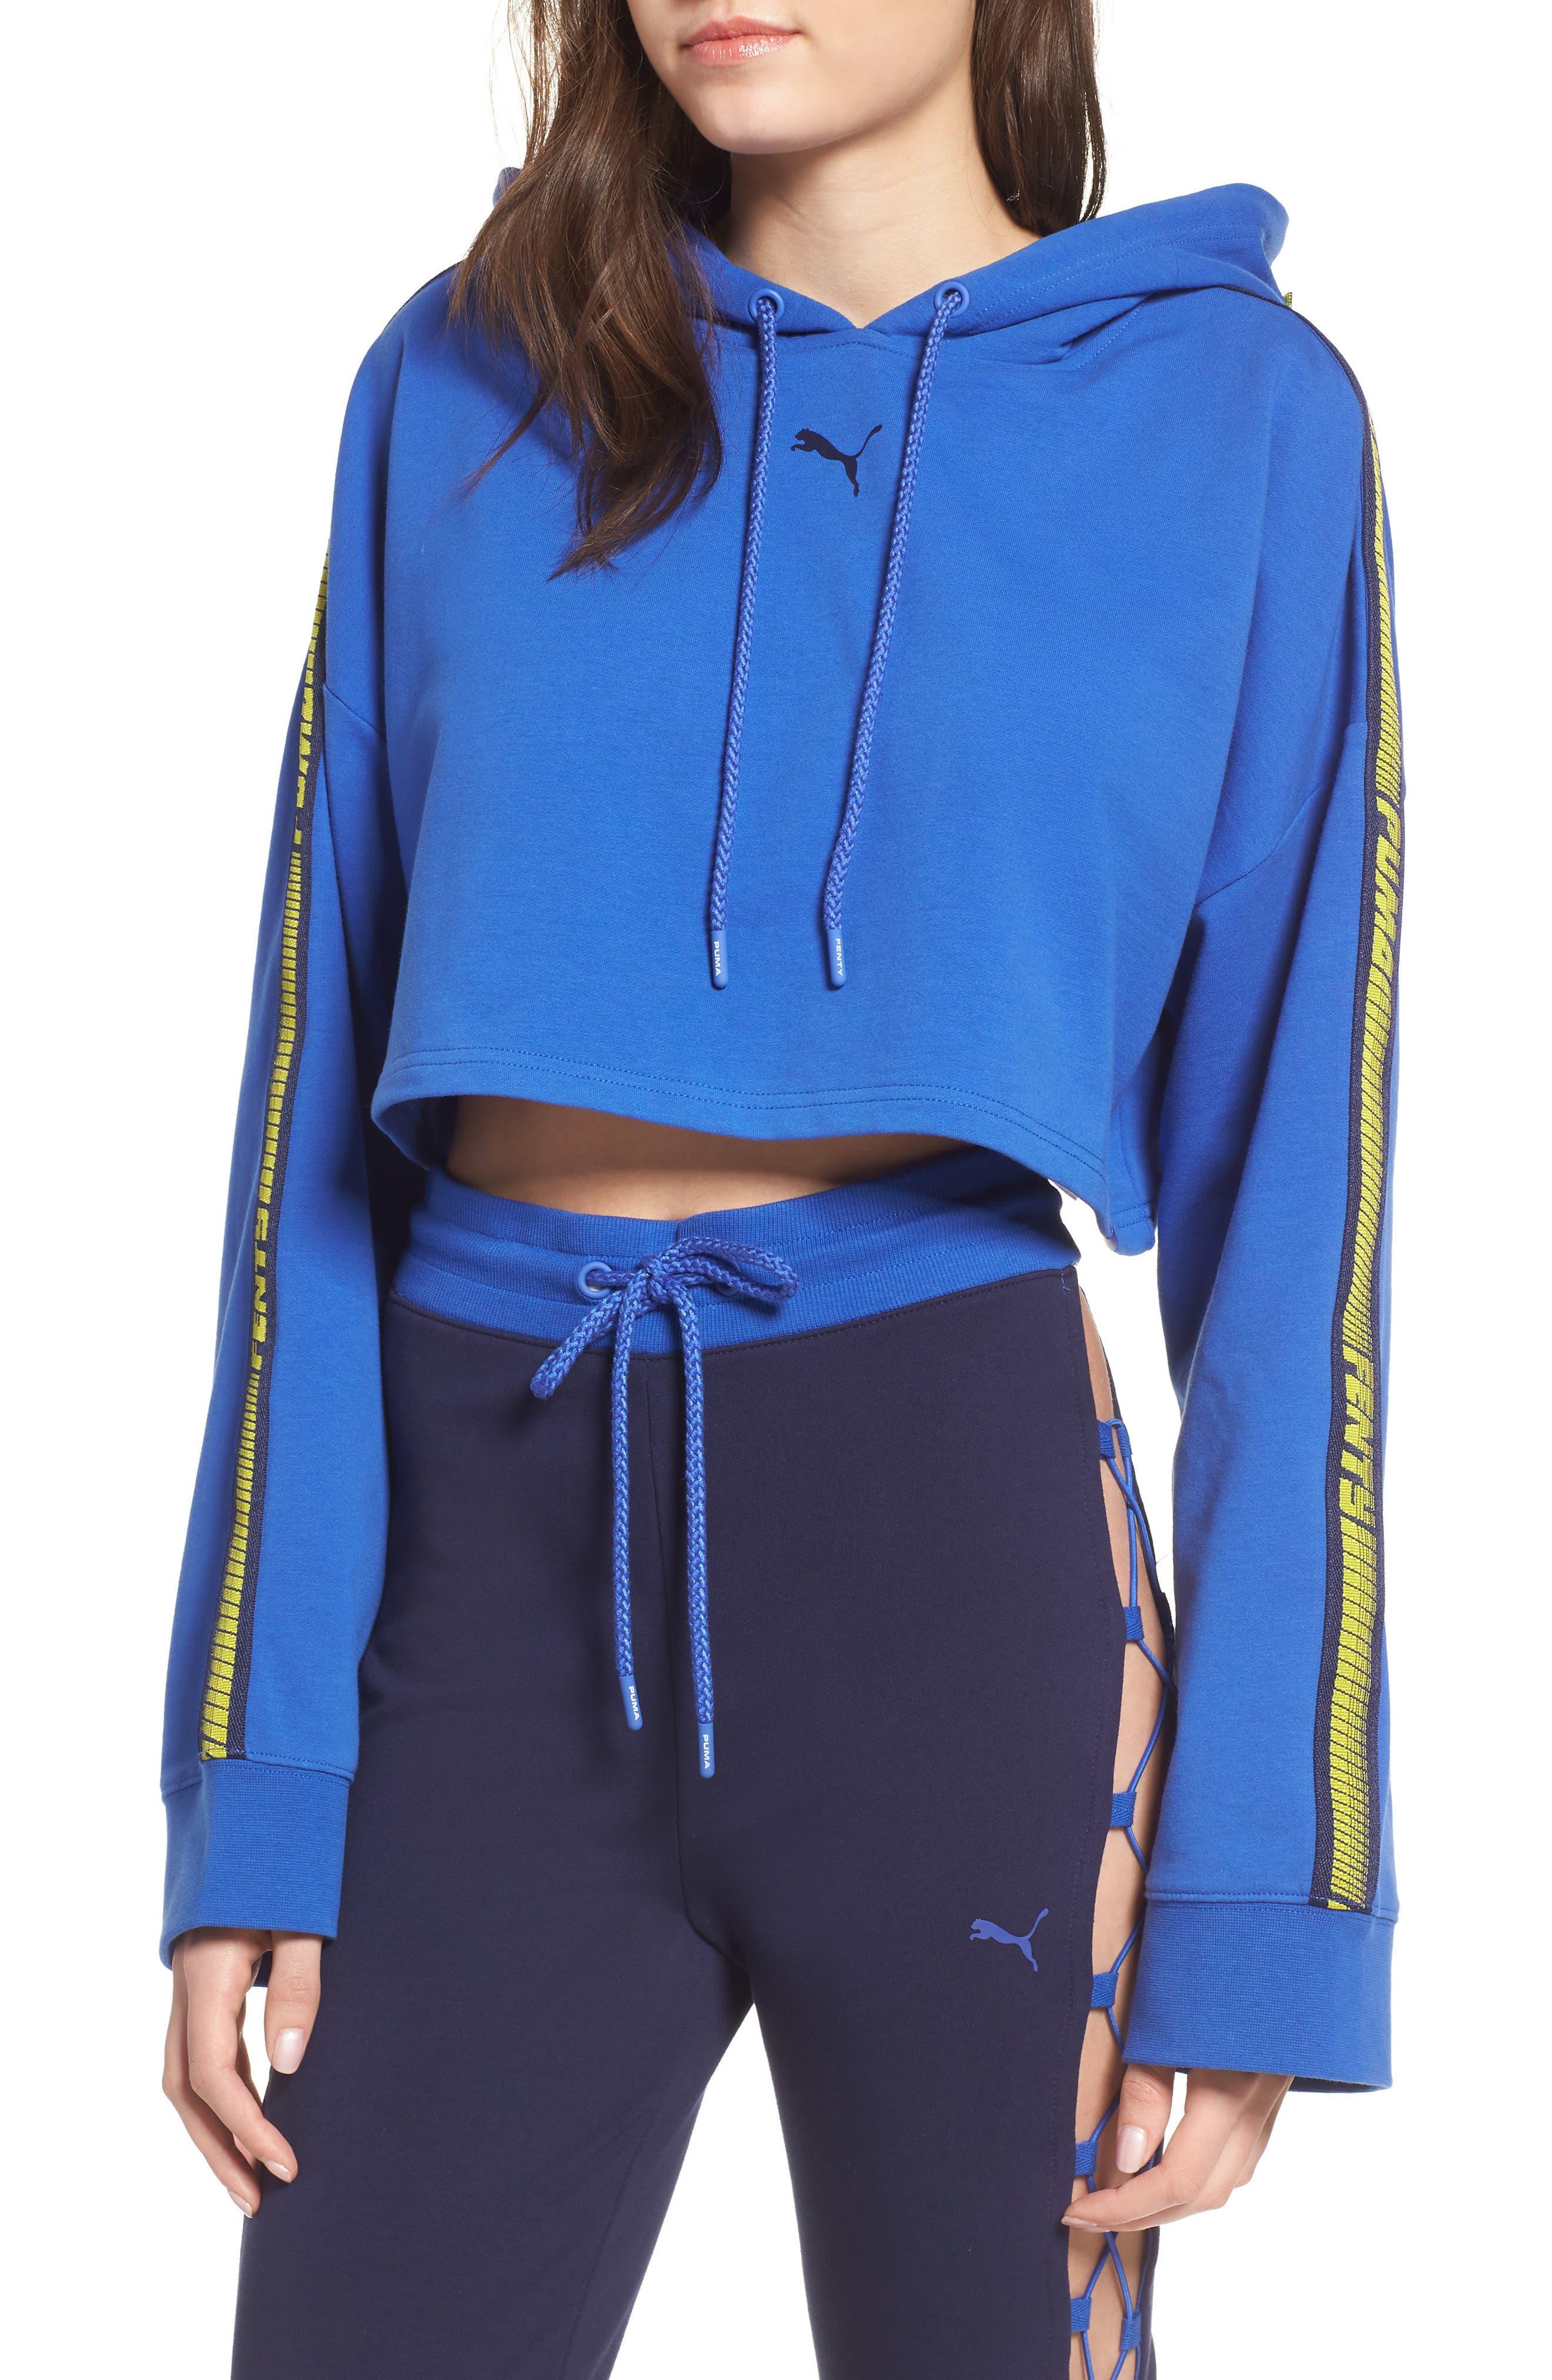 FENTY PUMA by Rihanna Hooded Crop Sweatshirt,                             Main thumbnail 1, color,                             Dazzling Blue